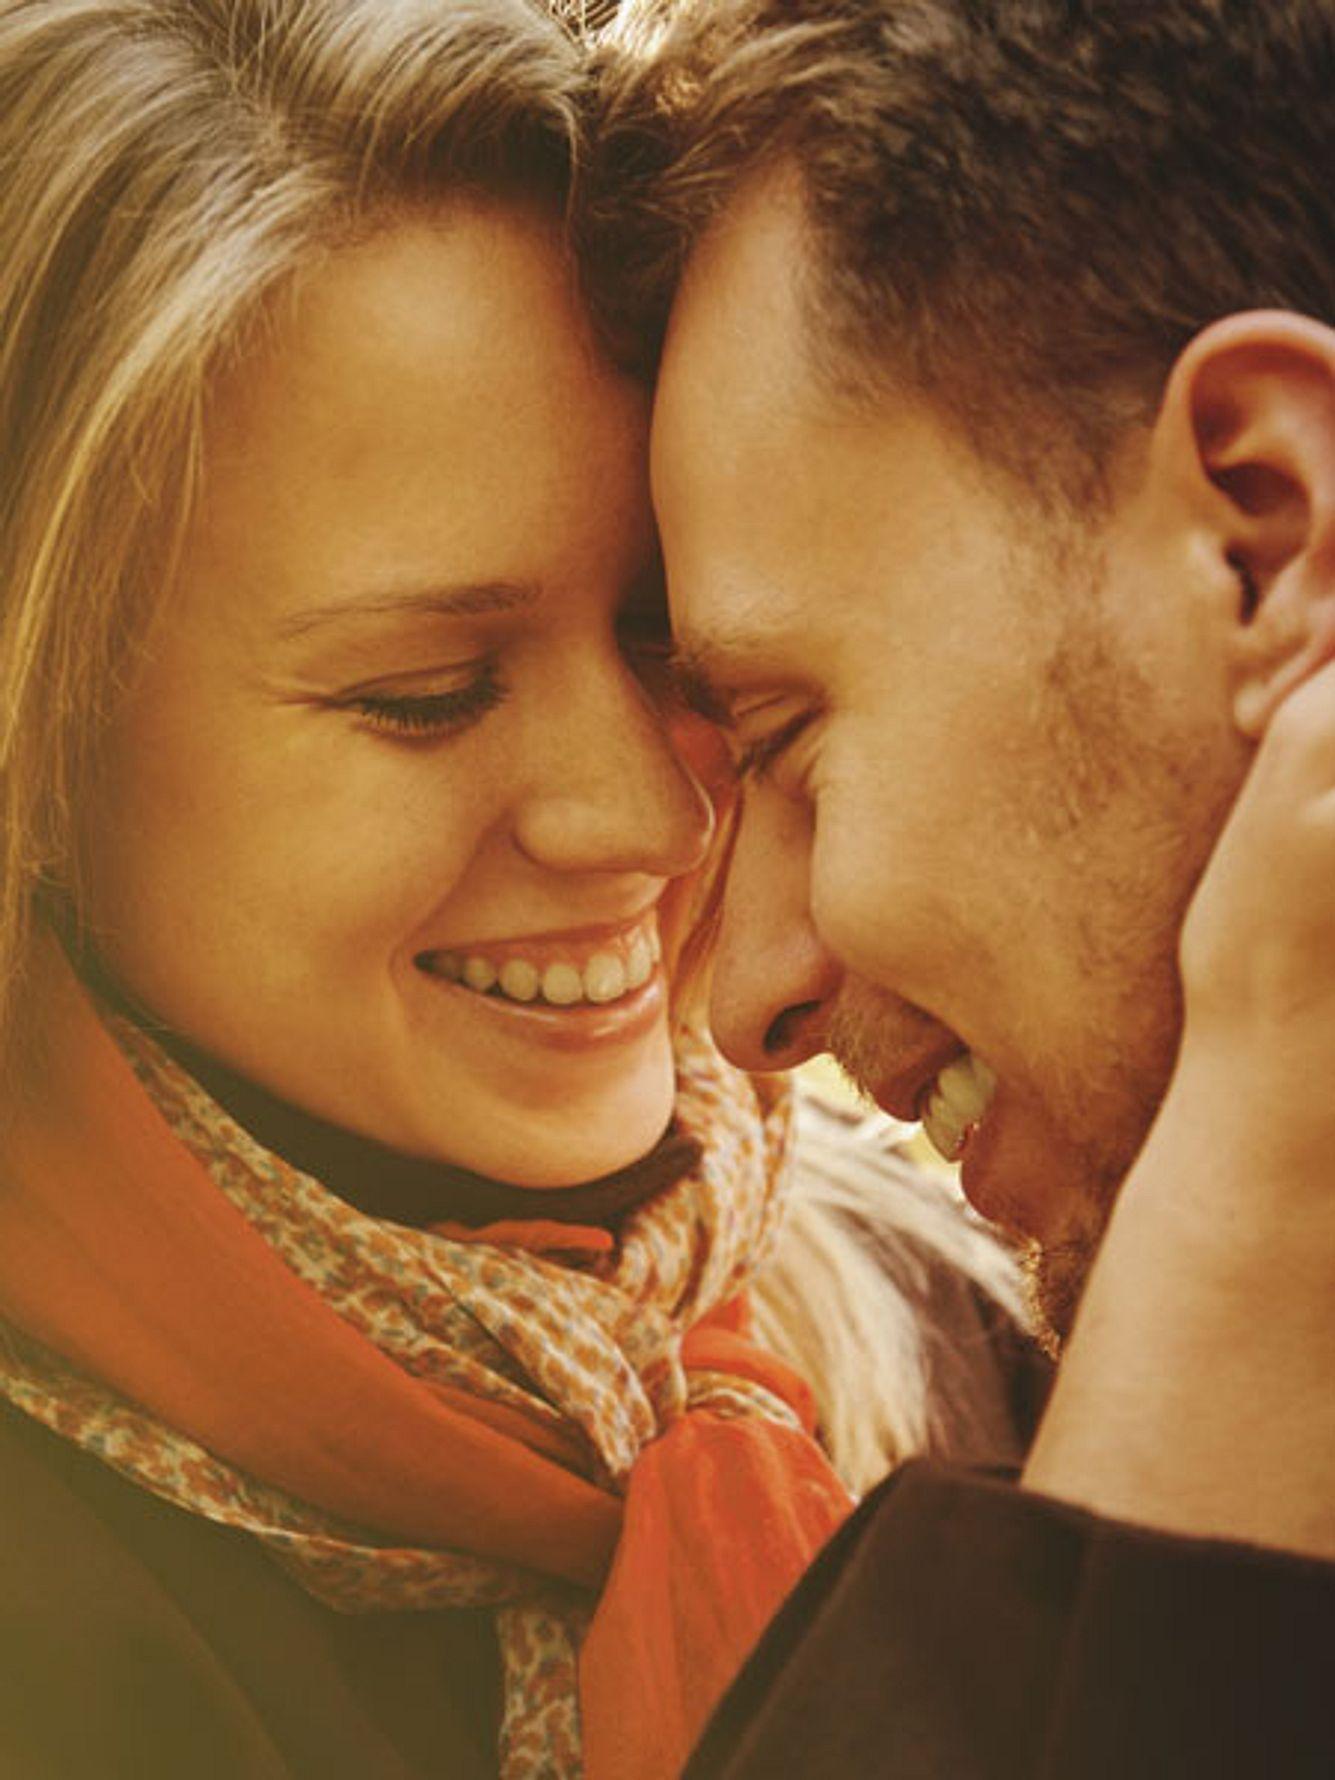 happy couple in love 000053